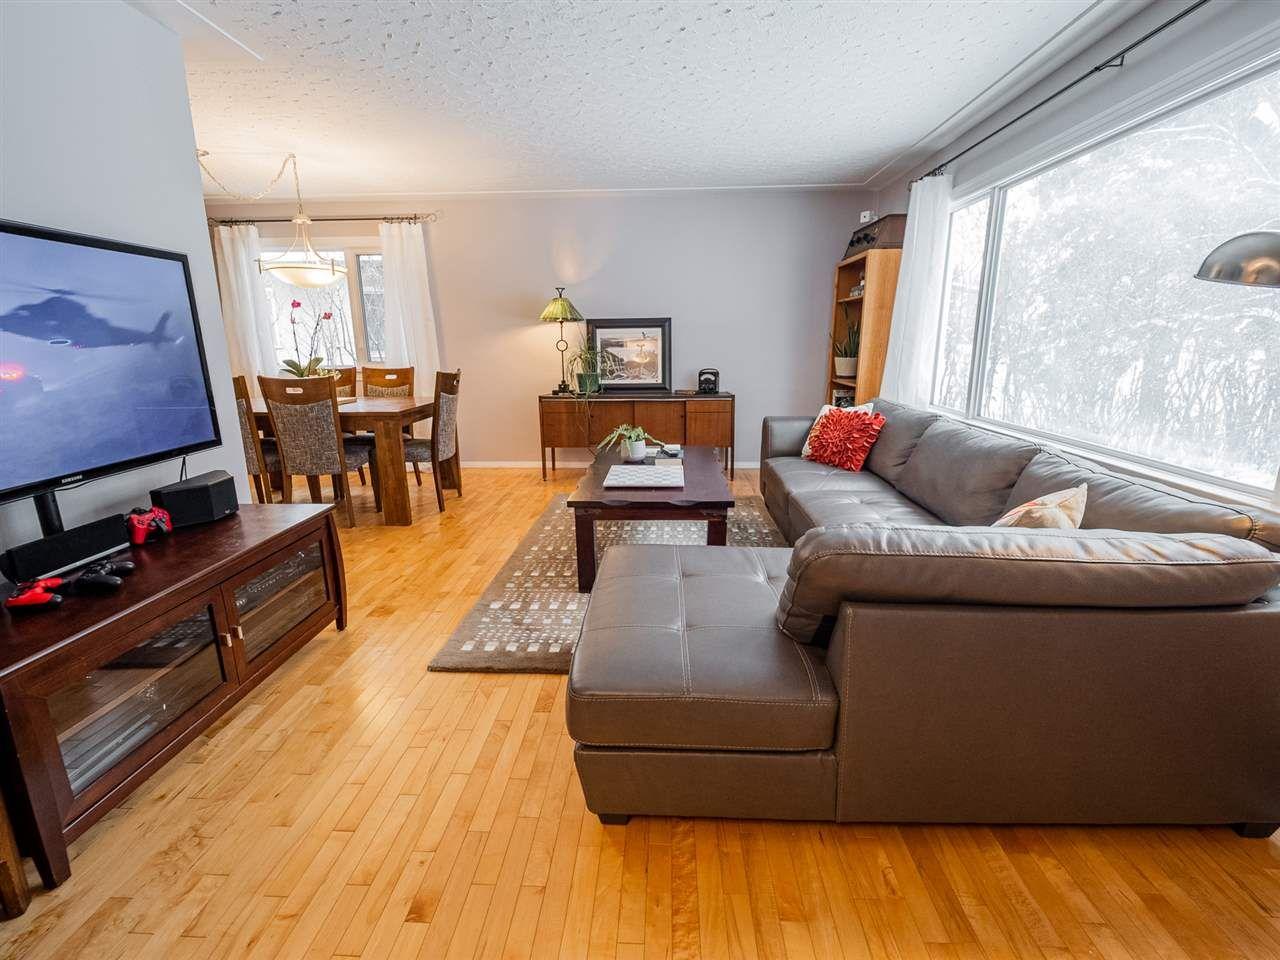 Main Photo: 5403 106 Street in Edmonton: Zone 15 House for sale : MLS®# E4228041